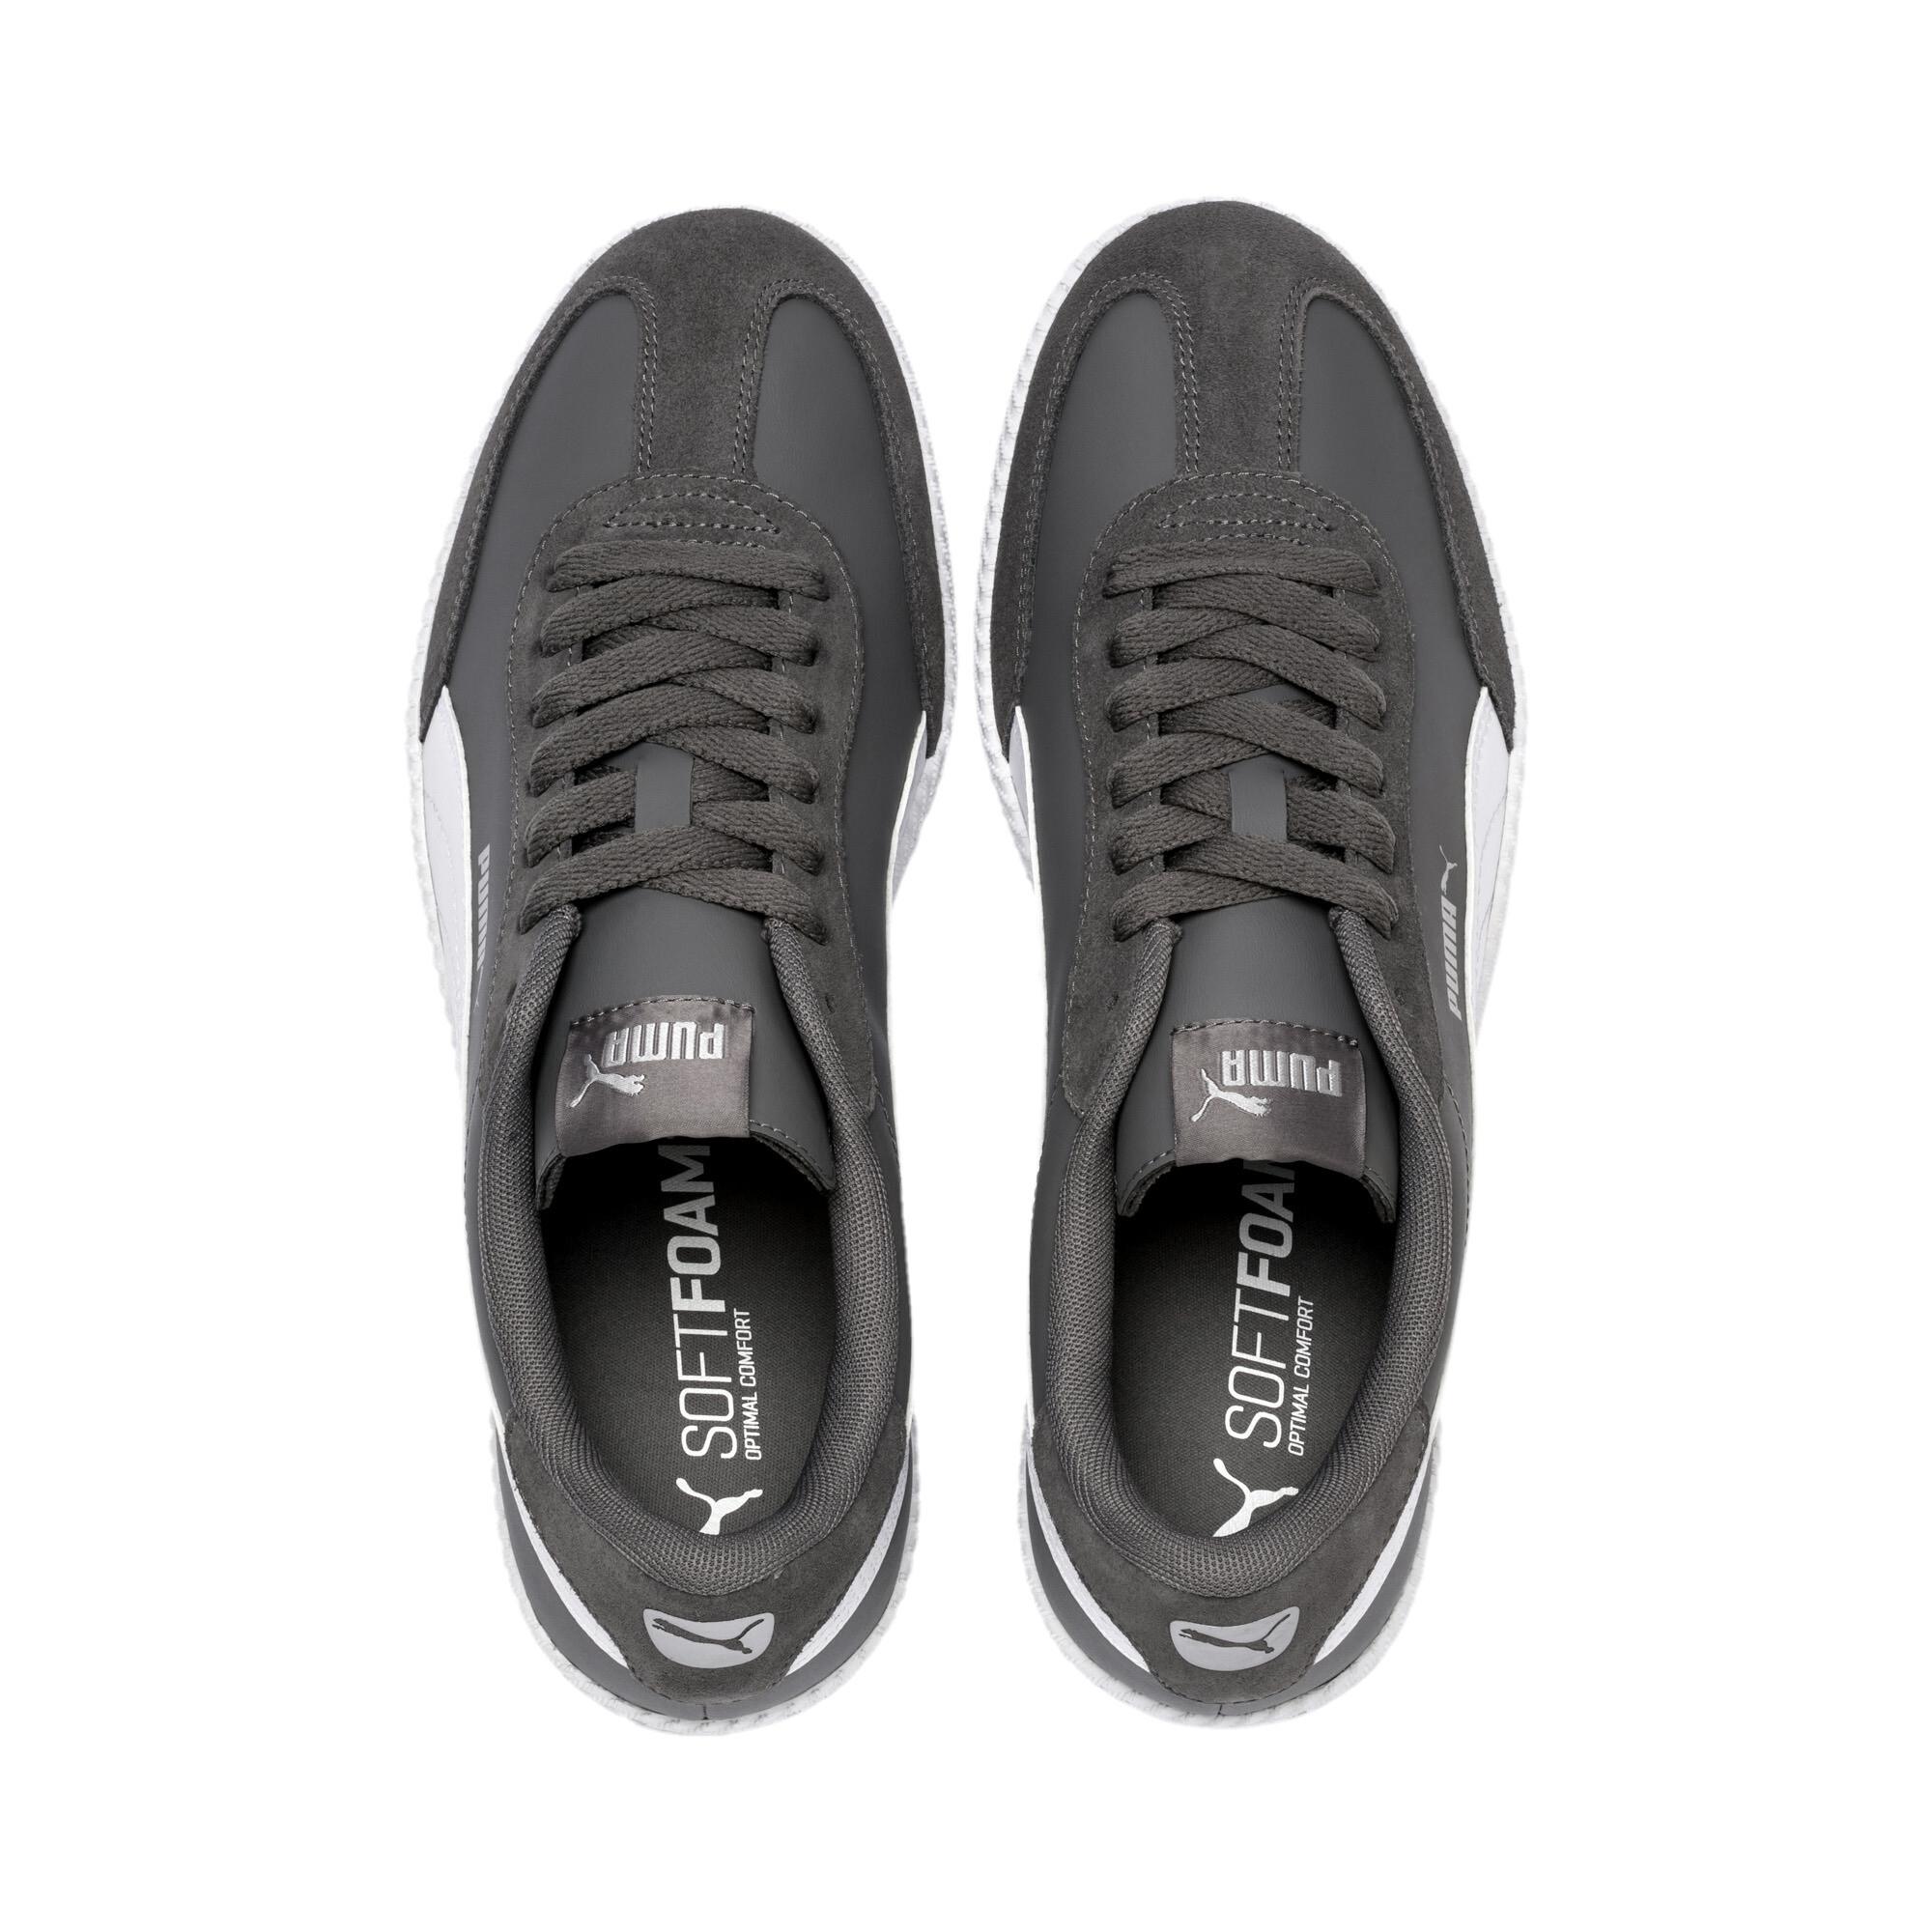 PUMA-Astro-Cup-Men-039-s-Sneakers-Men-Shoe-Basics thumbnail 24